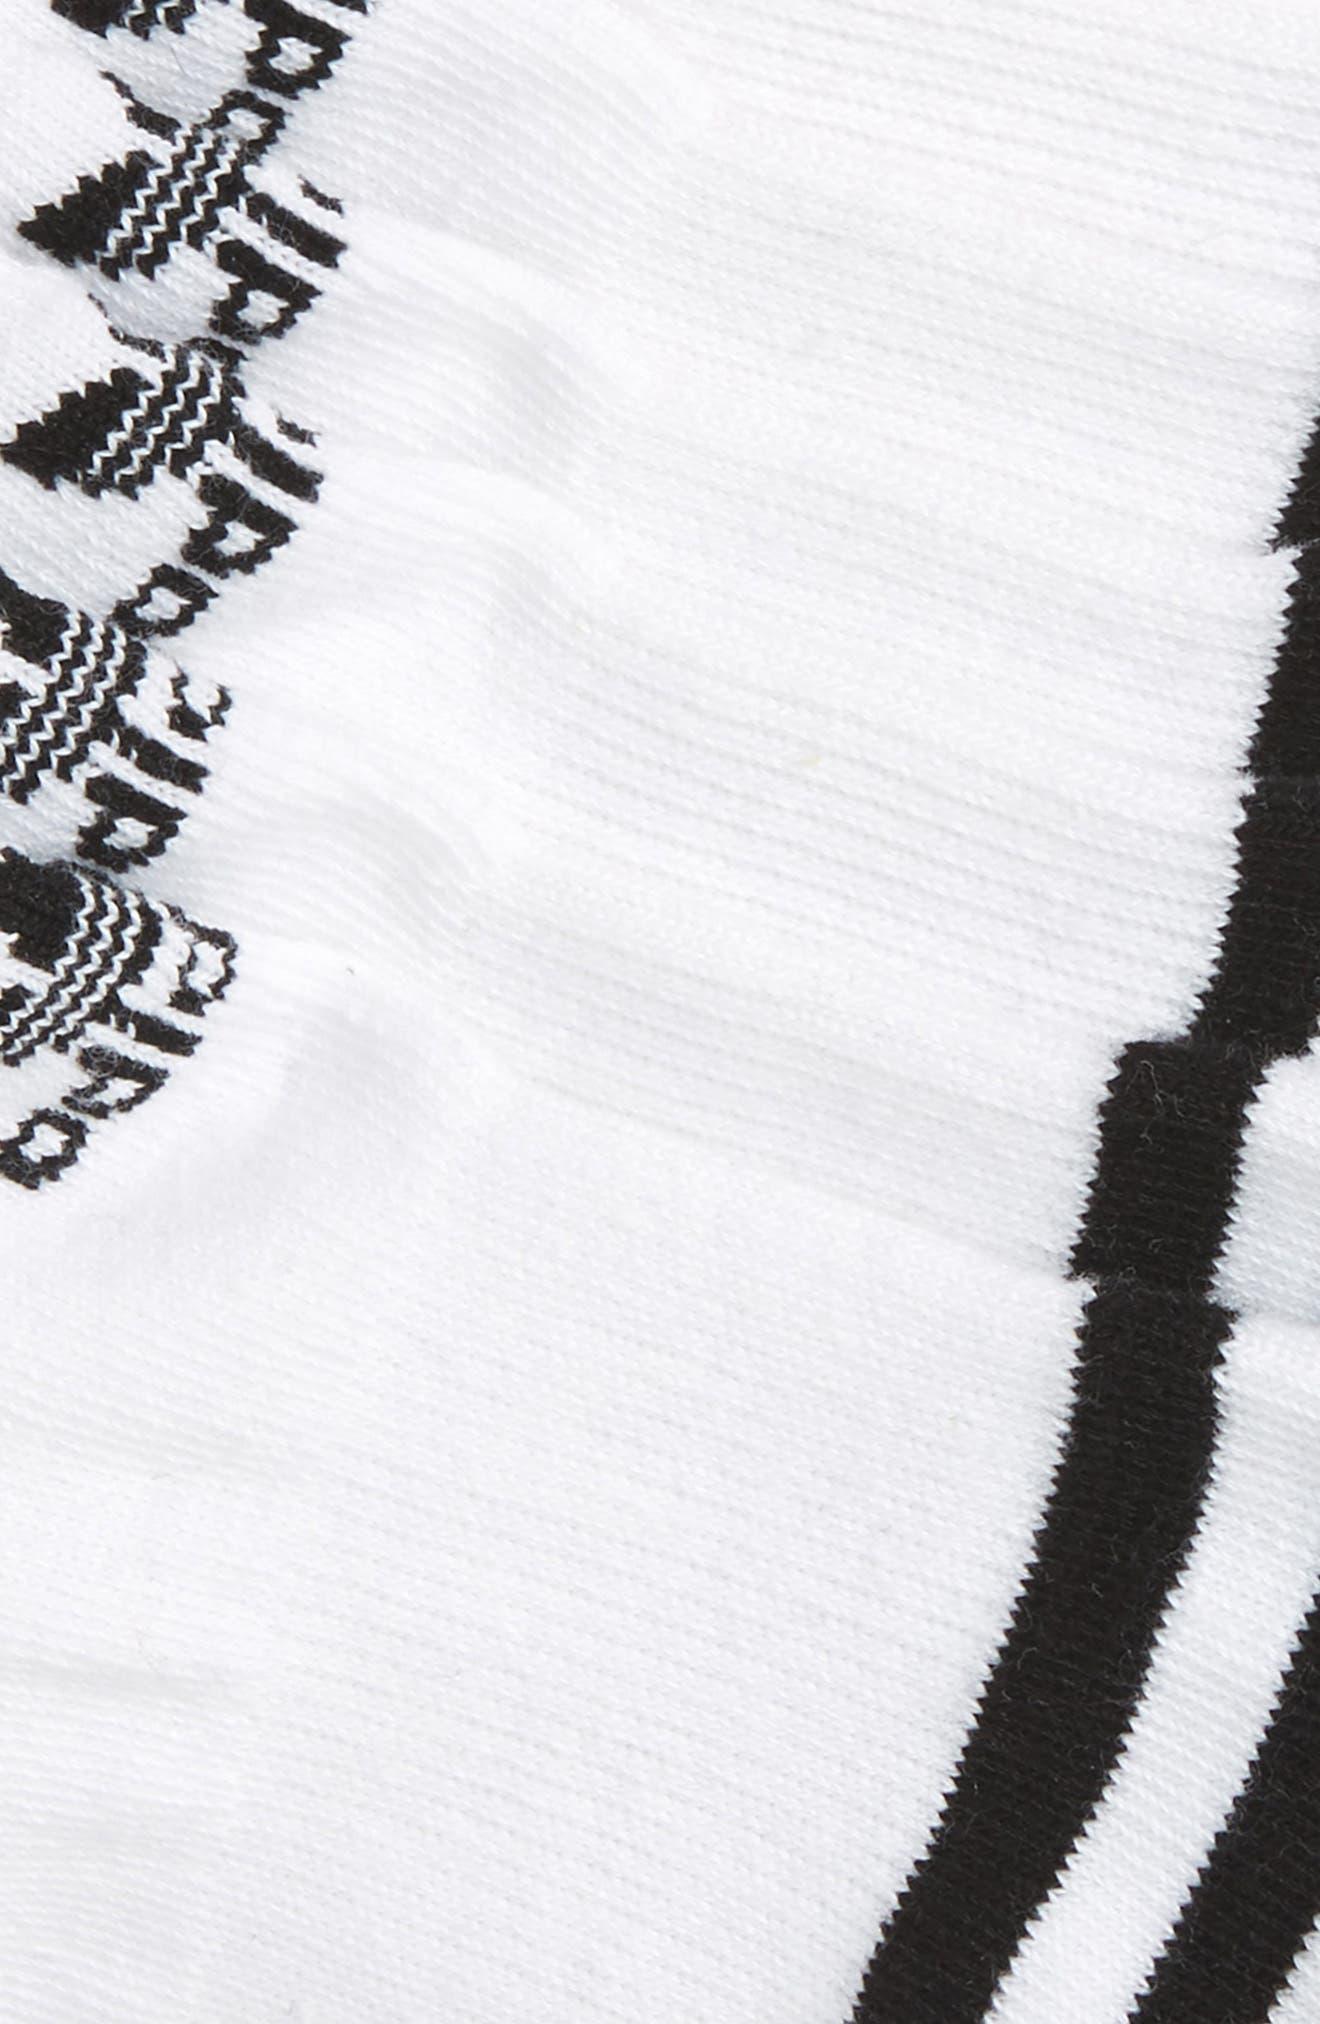 3-Pack Original Cushioned No-Show Socks,                             Alternate thumbnail 2, color,                             White/ Black/ White